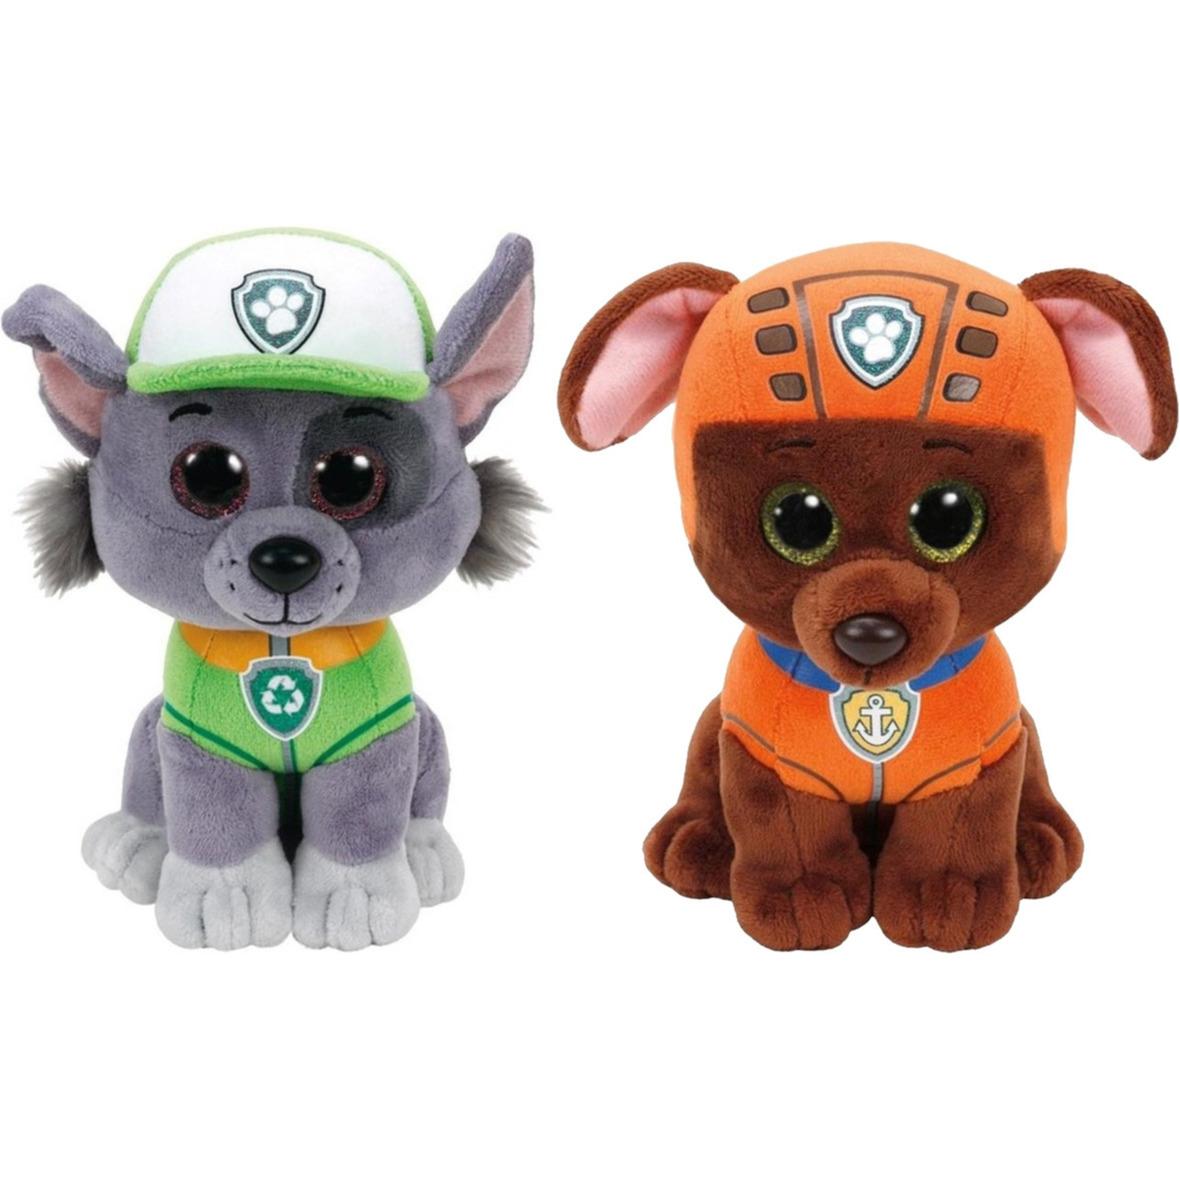 Paw patrol knuffels set van 2x karakters rocky en zuma 15 cm